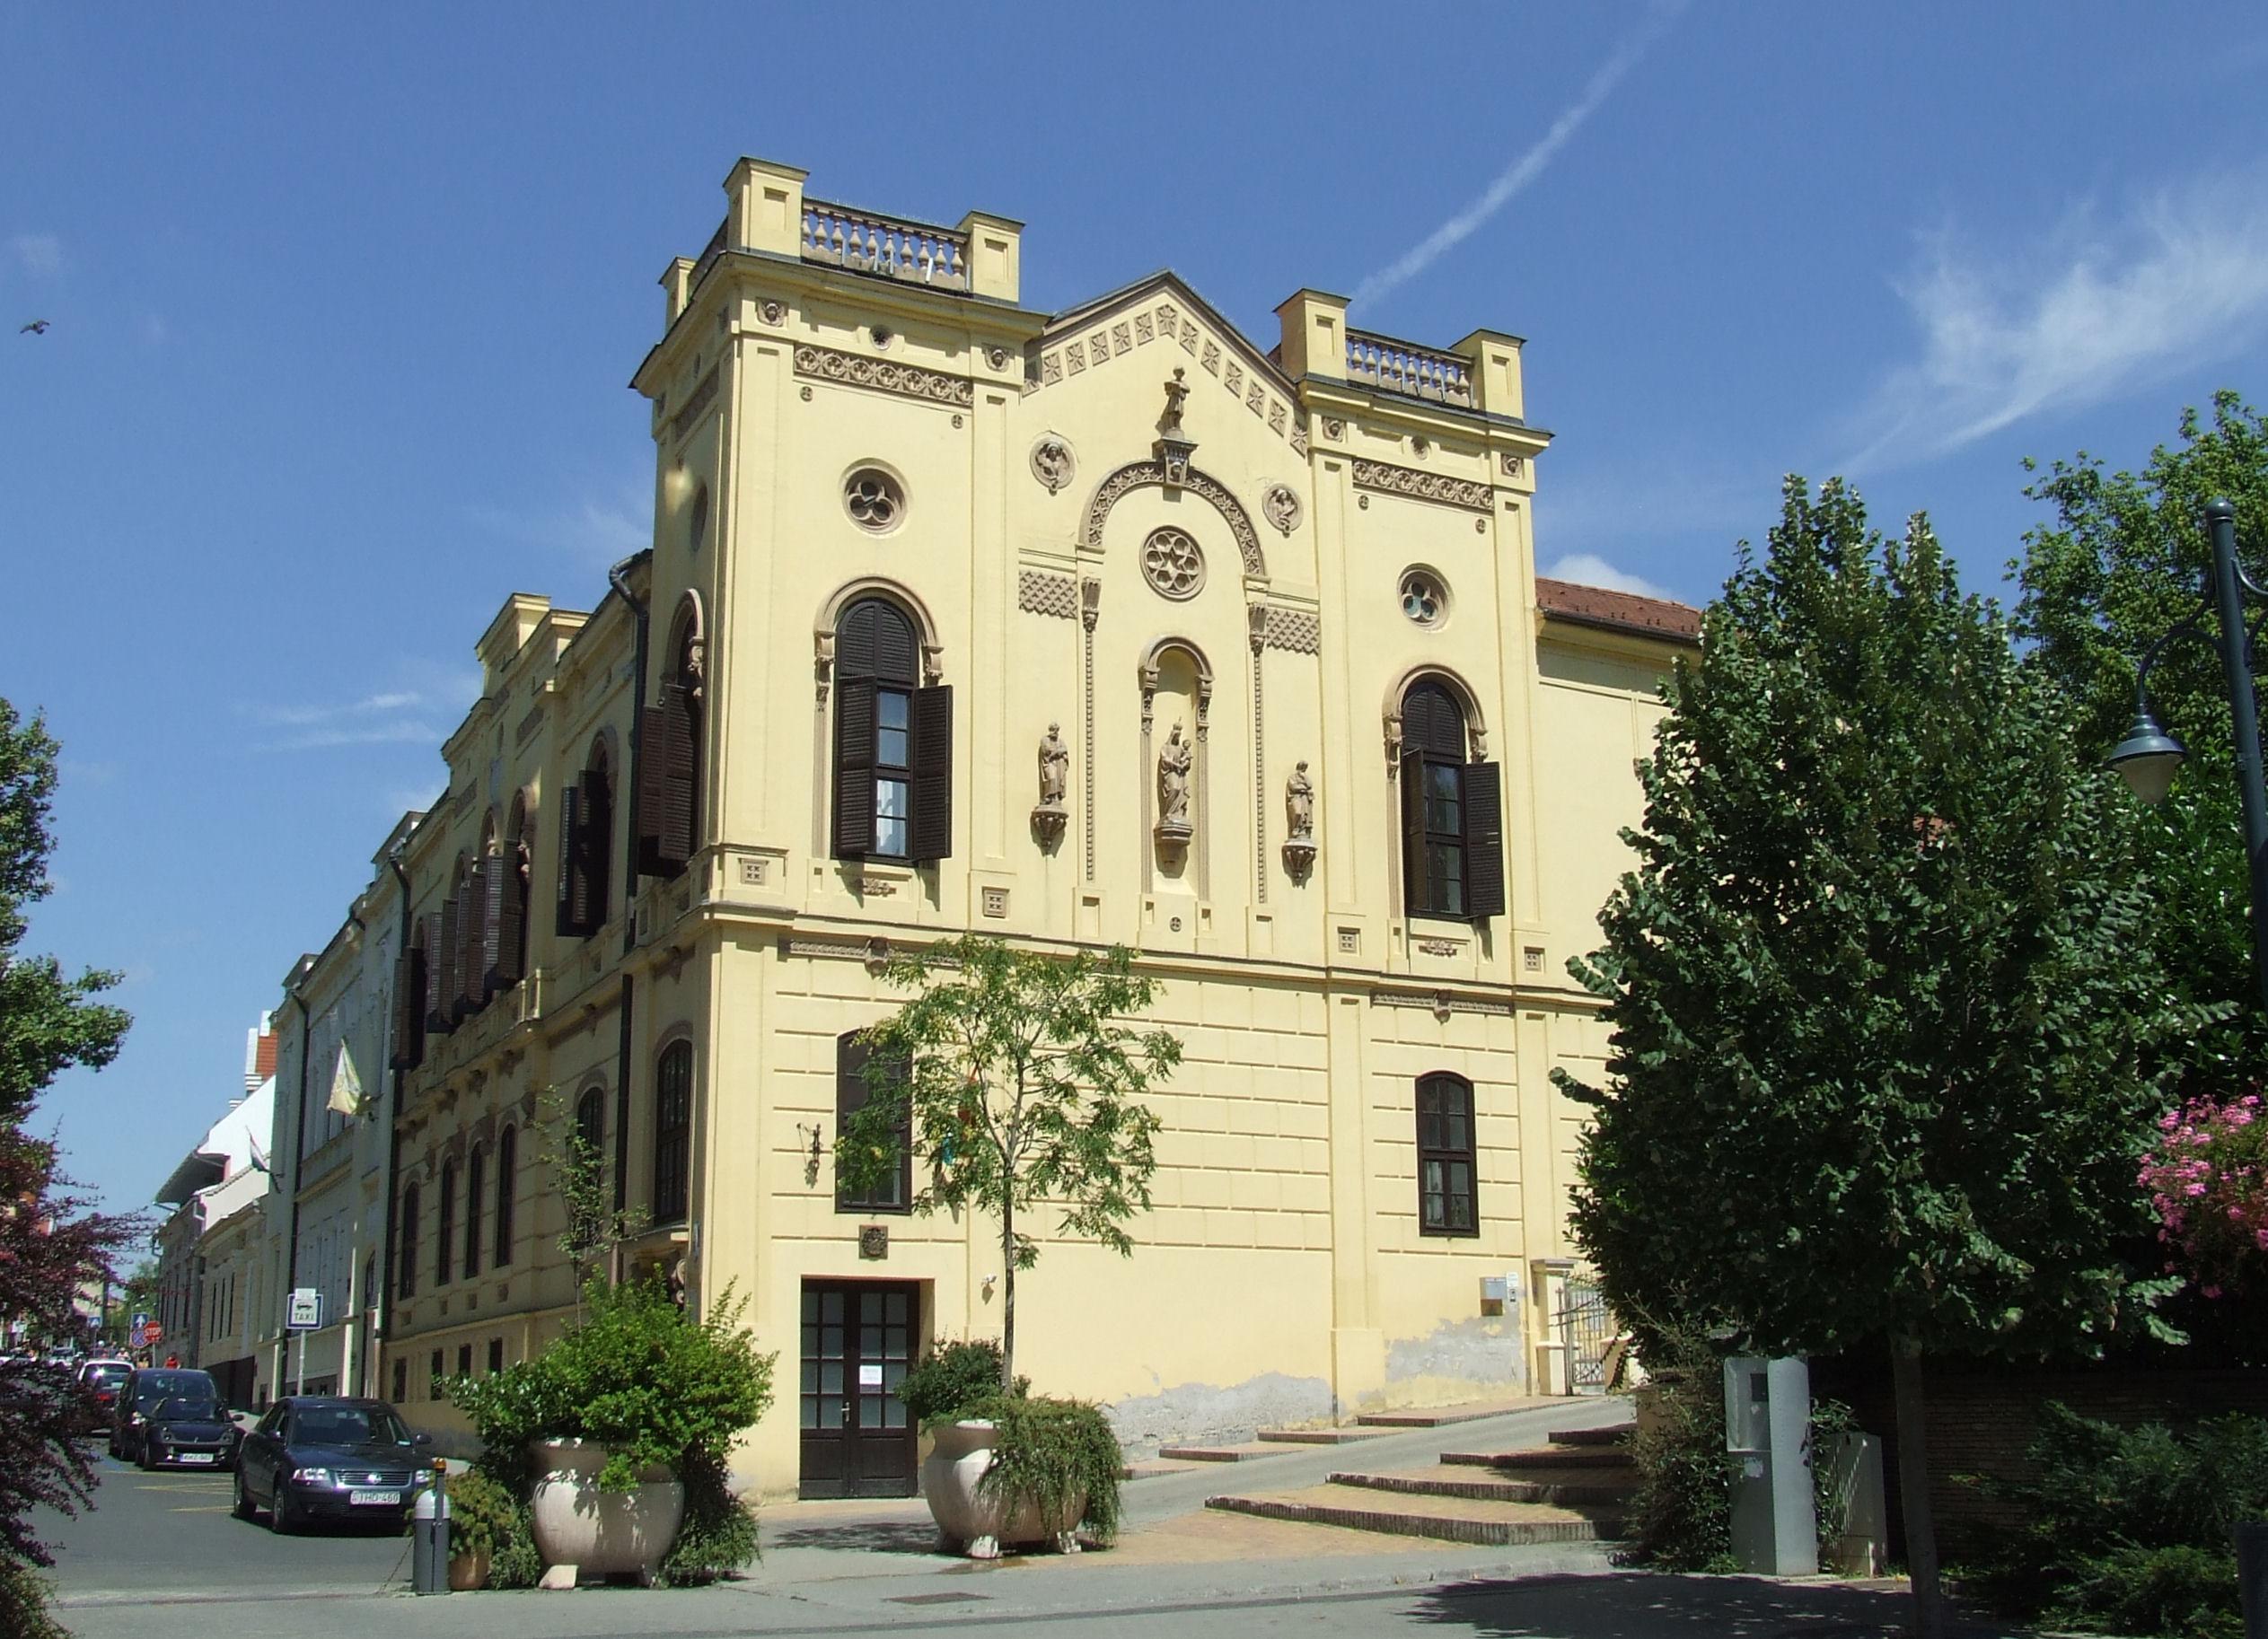 File:Kaposvár Zárda.JPG - Wikimedia Commons